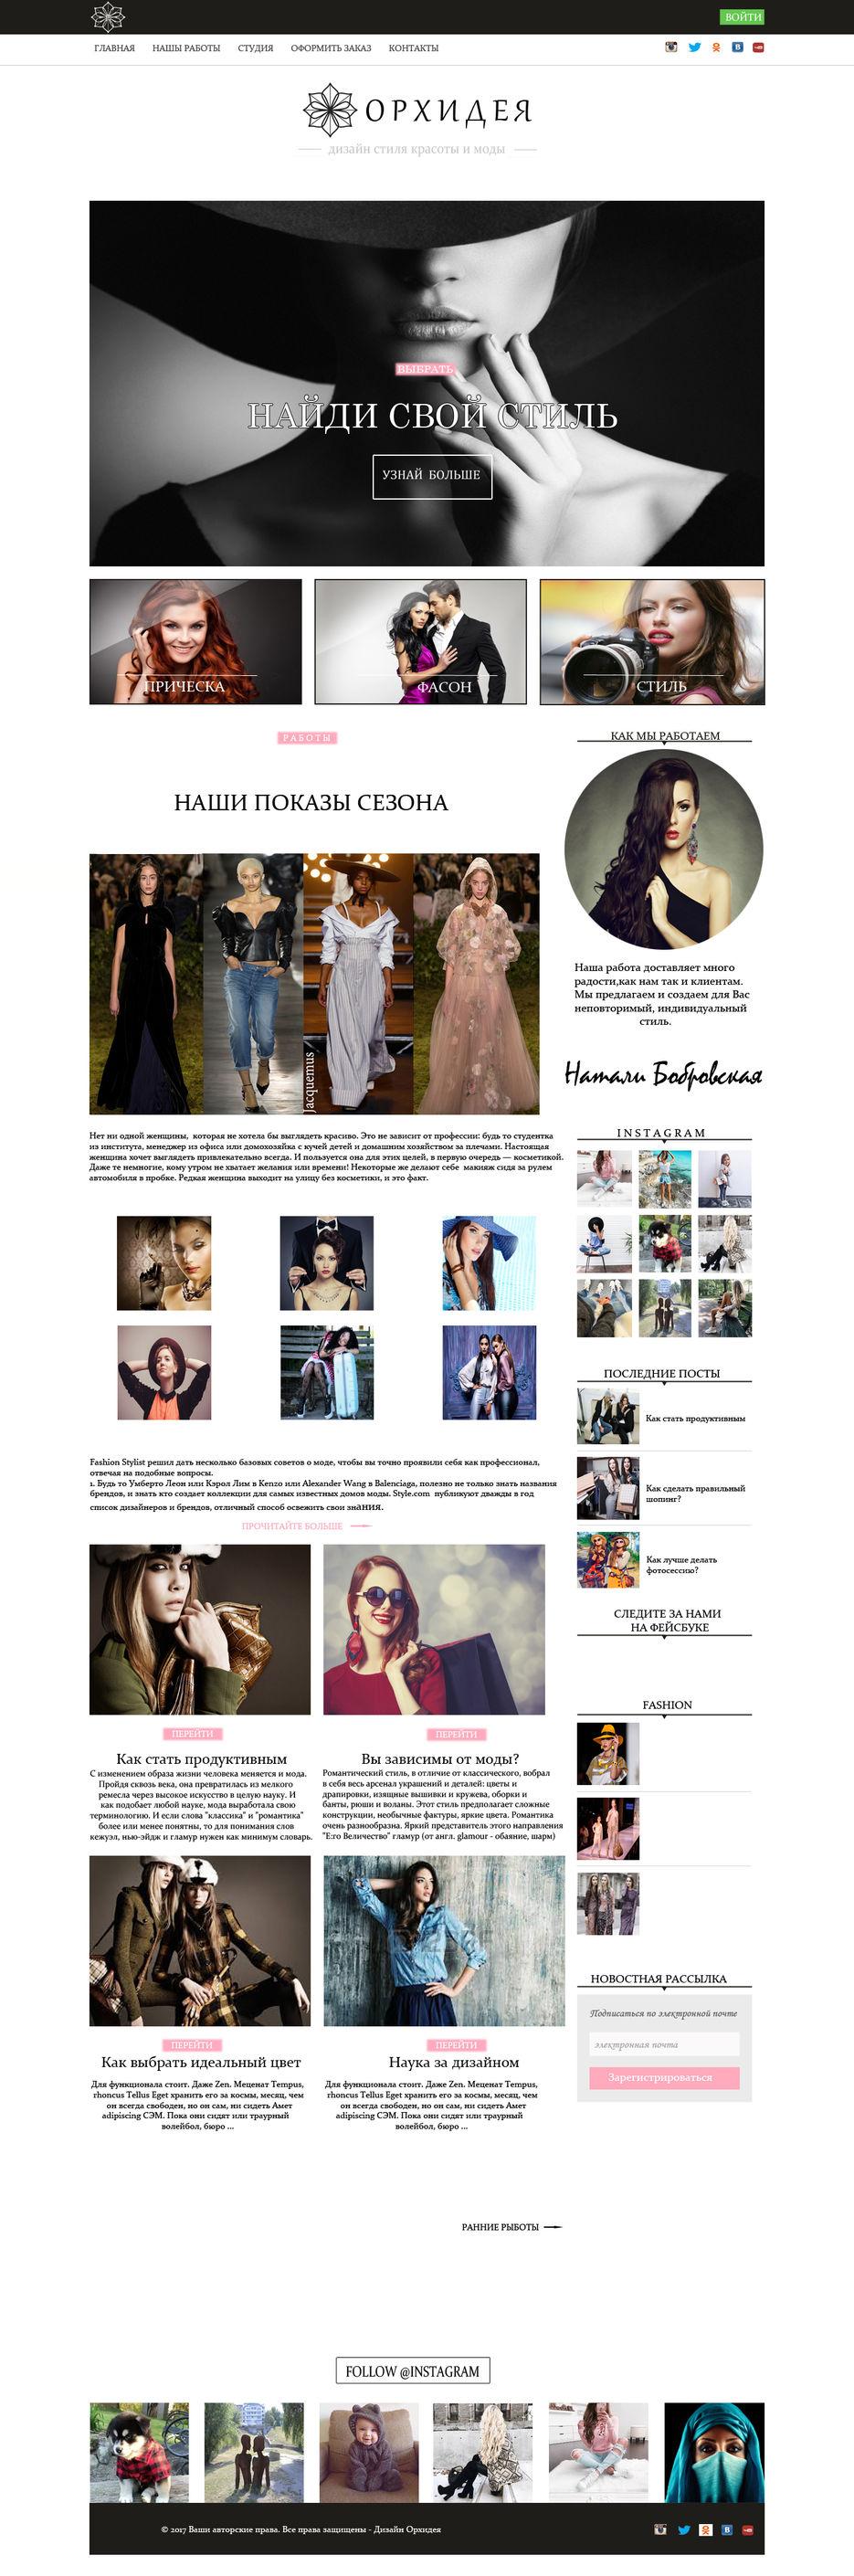 Модный сайт